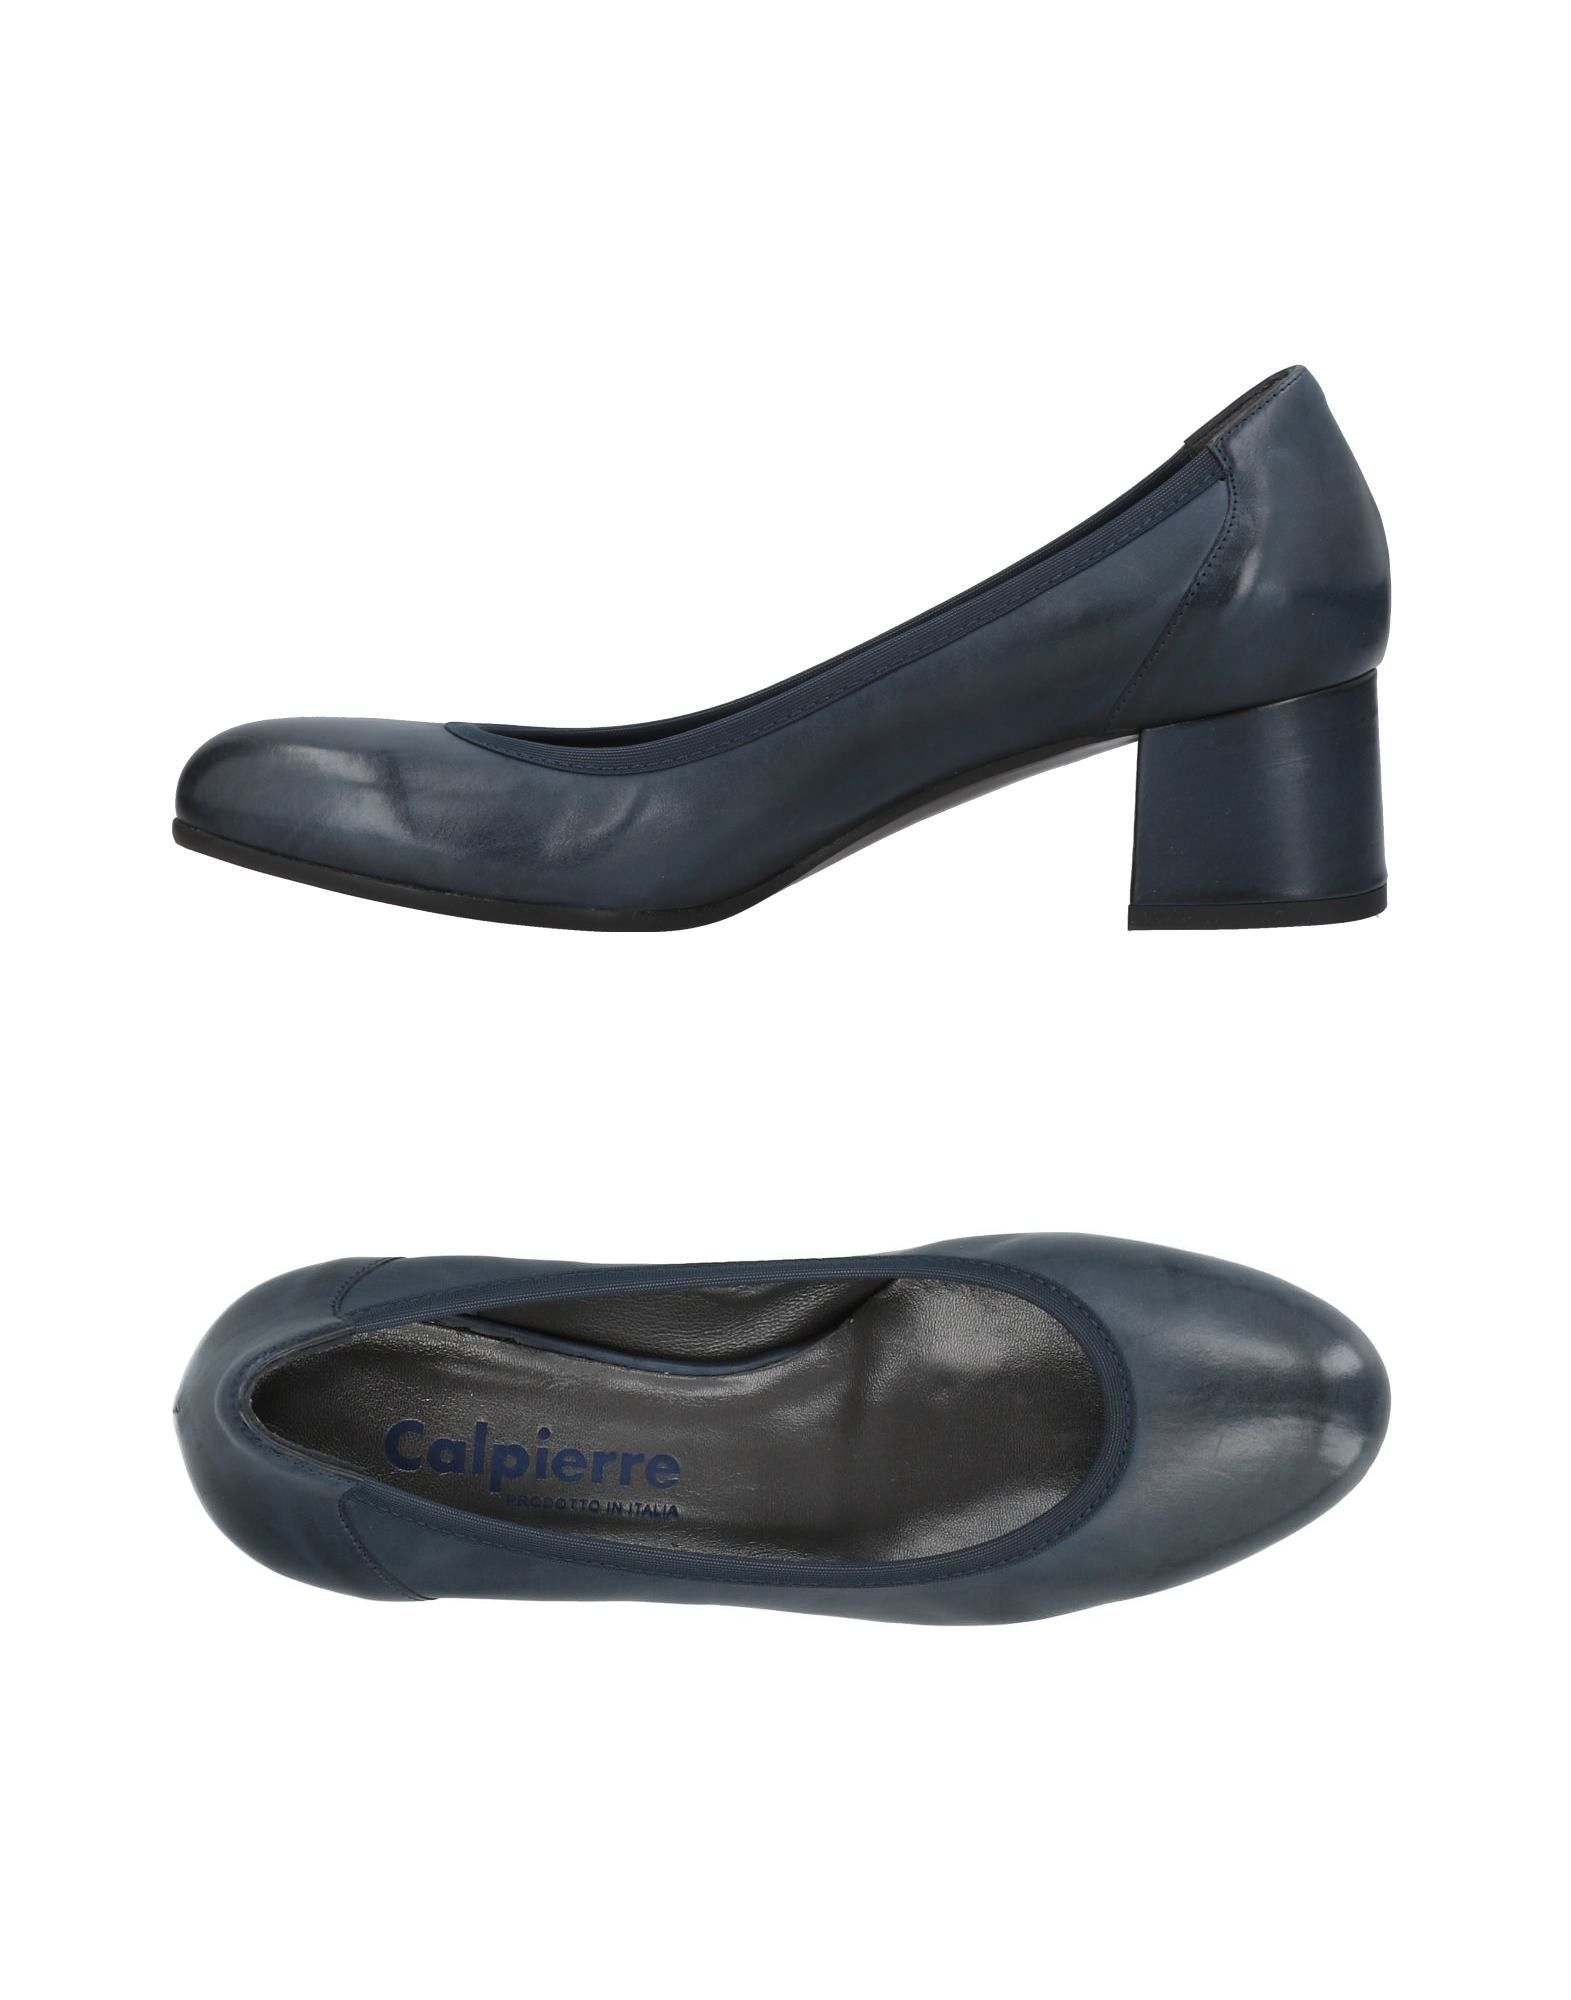 Gut um Pumps billige Schuhe zu tragenCalpierre Pumps um Damen  11459827SB 71b121